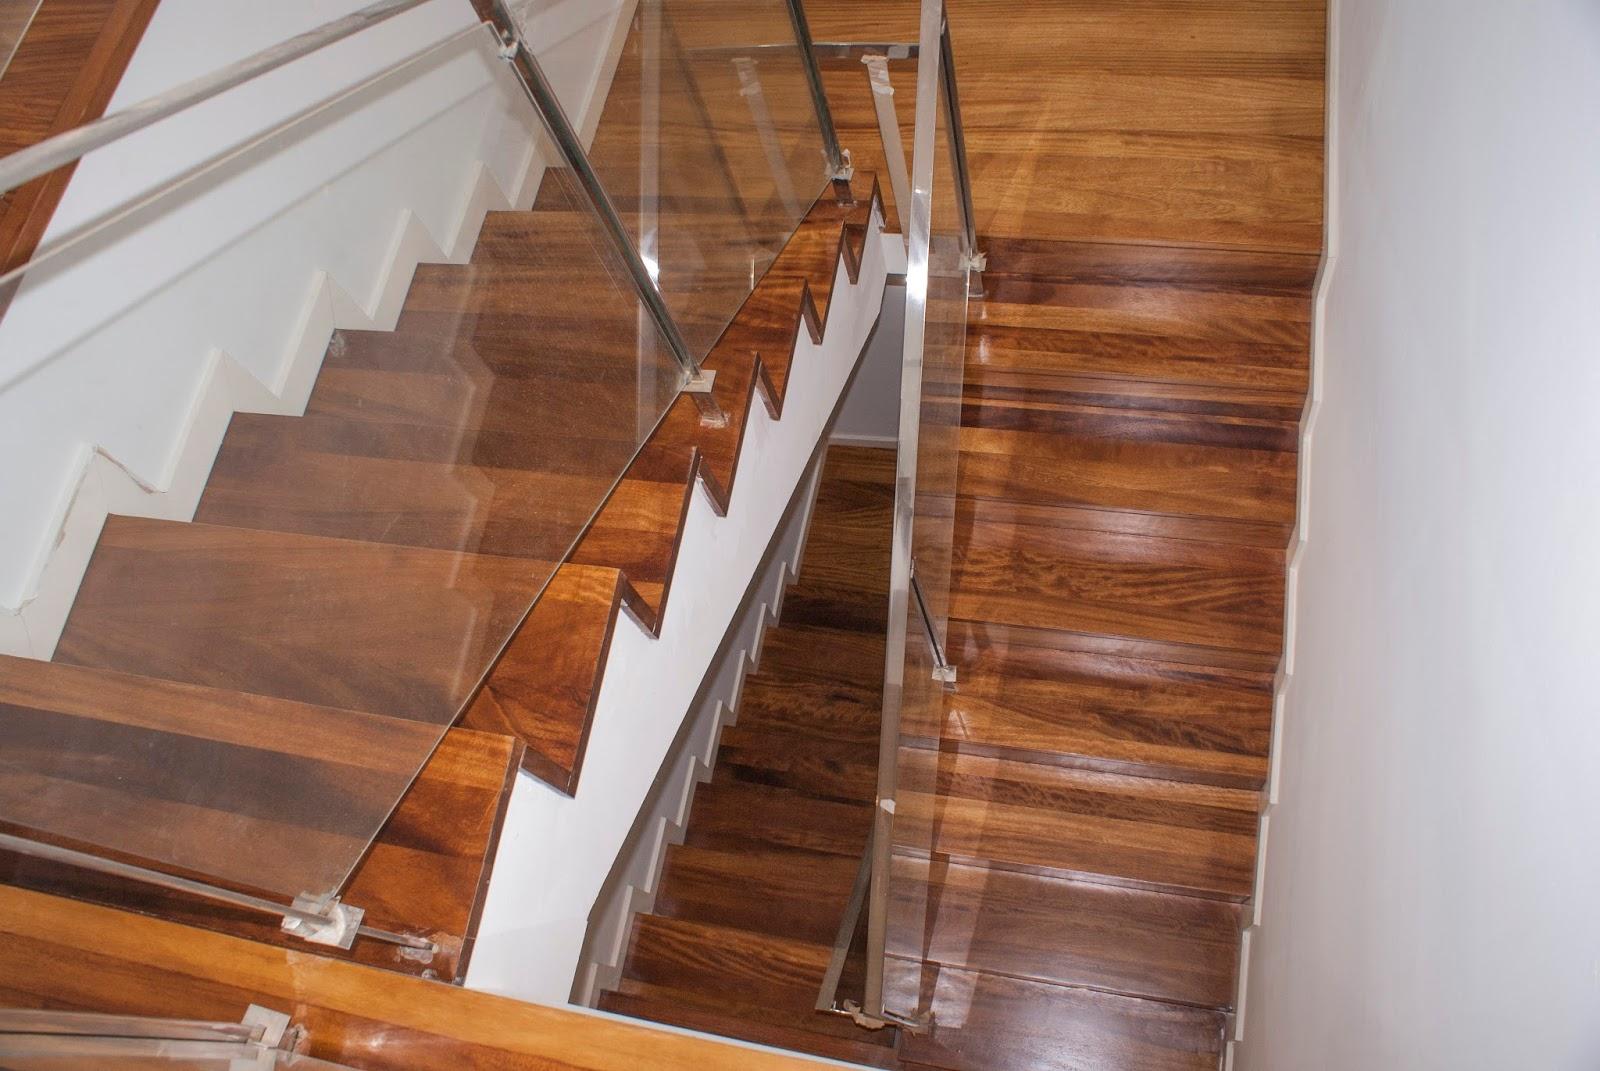 Acuchillar o restaurar una escalera de madera for Escalera 9 escalones